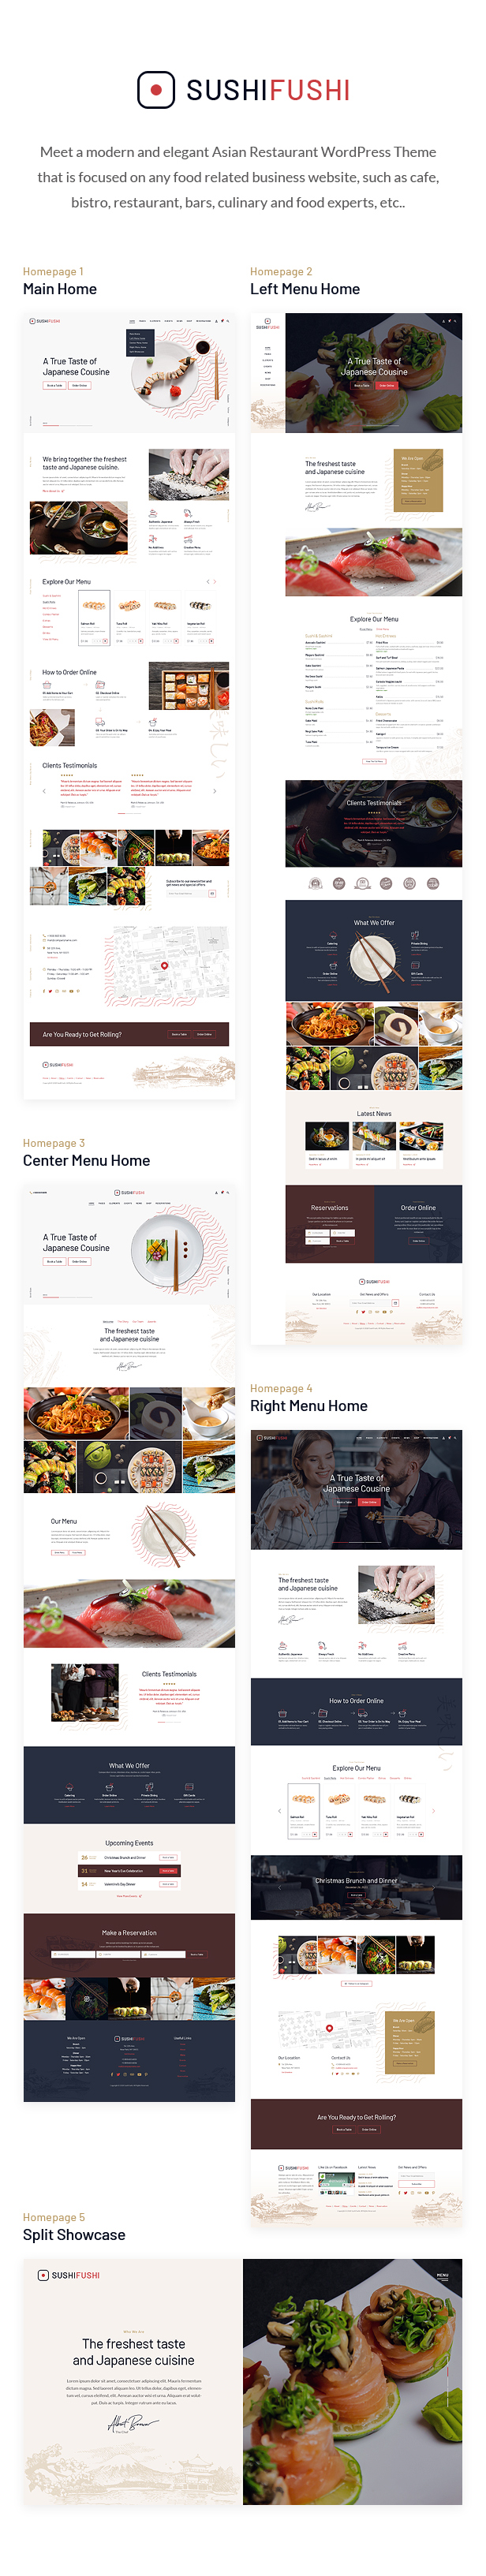 SushiFushi - Japanese & Asian Restaurant WordPress Theme - 1